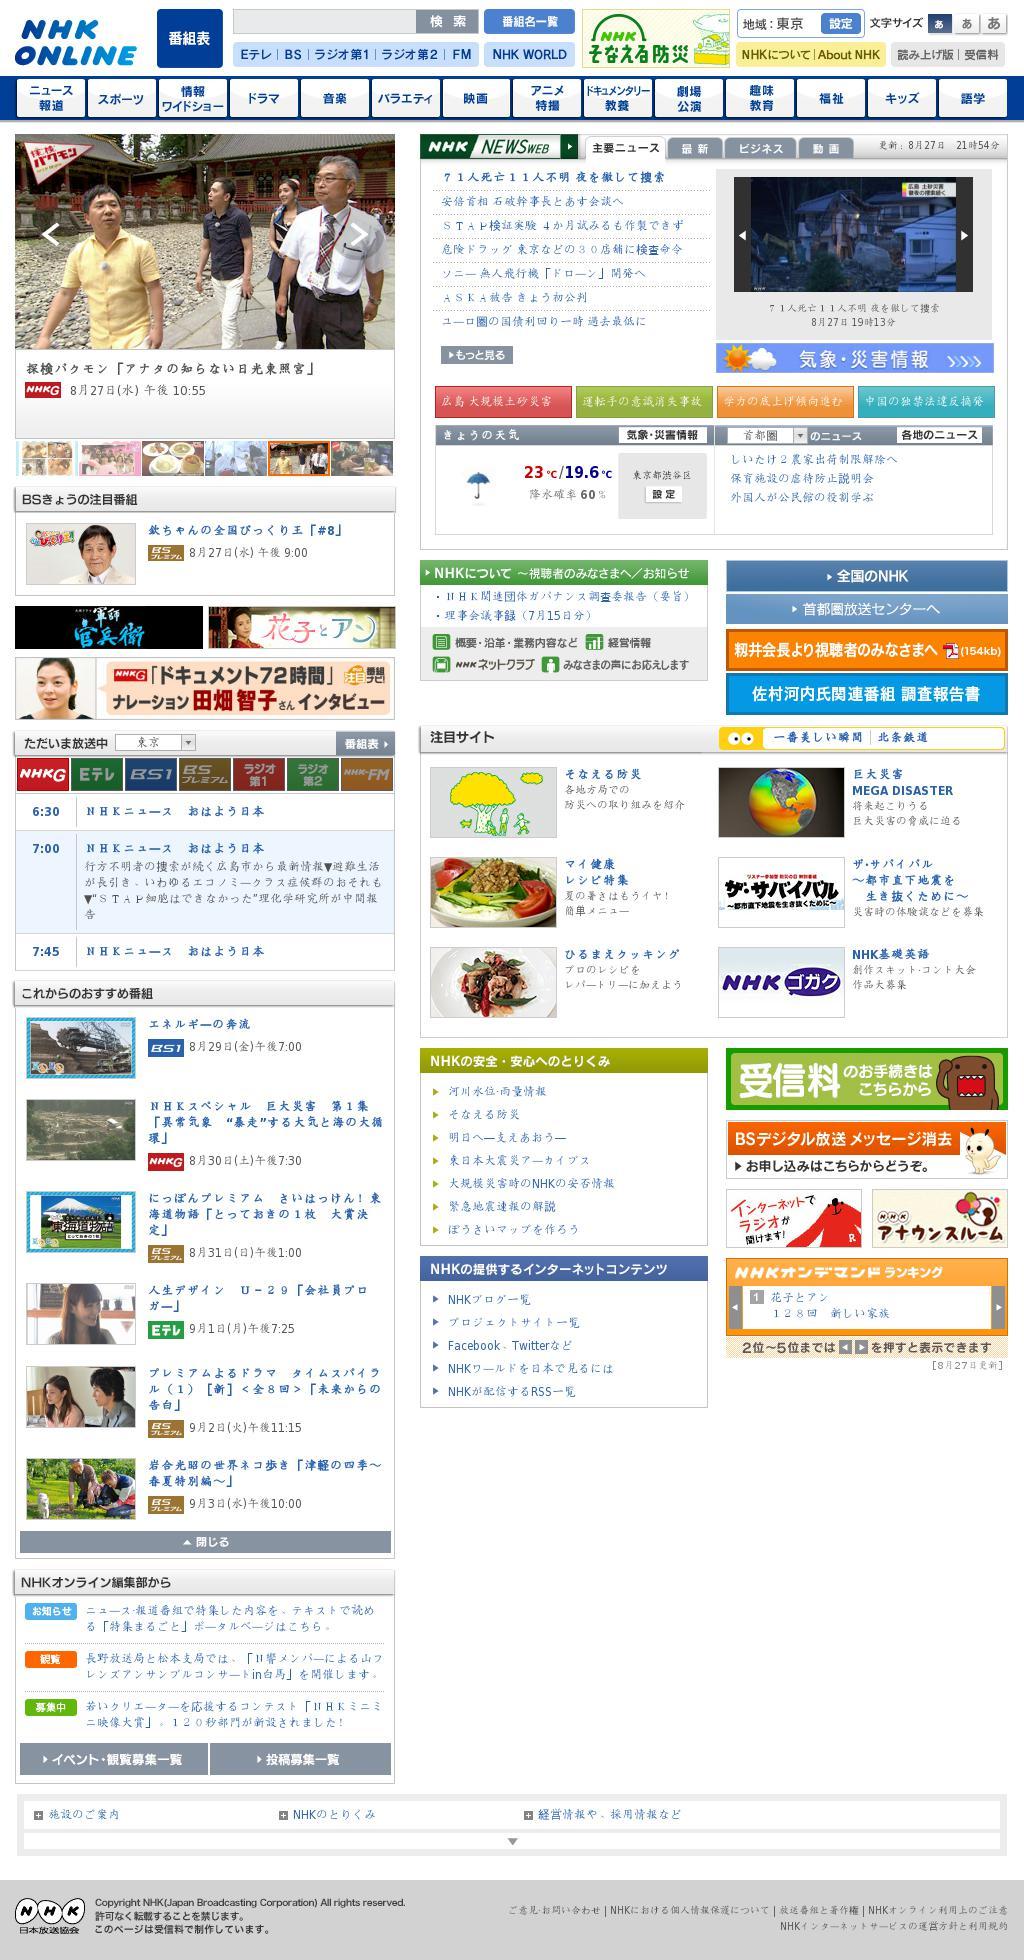 NHK Online at Wednesday Aug. 27, 2014, 10:12 p.m. UTC